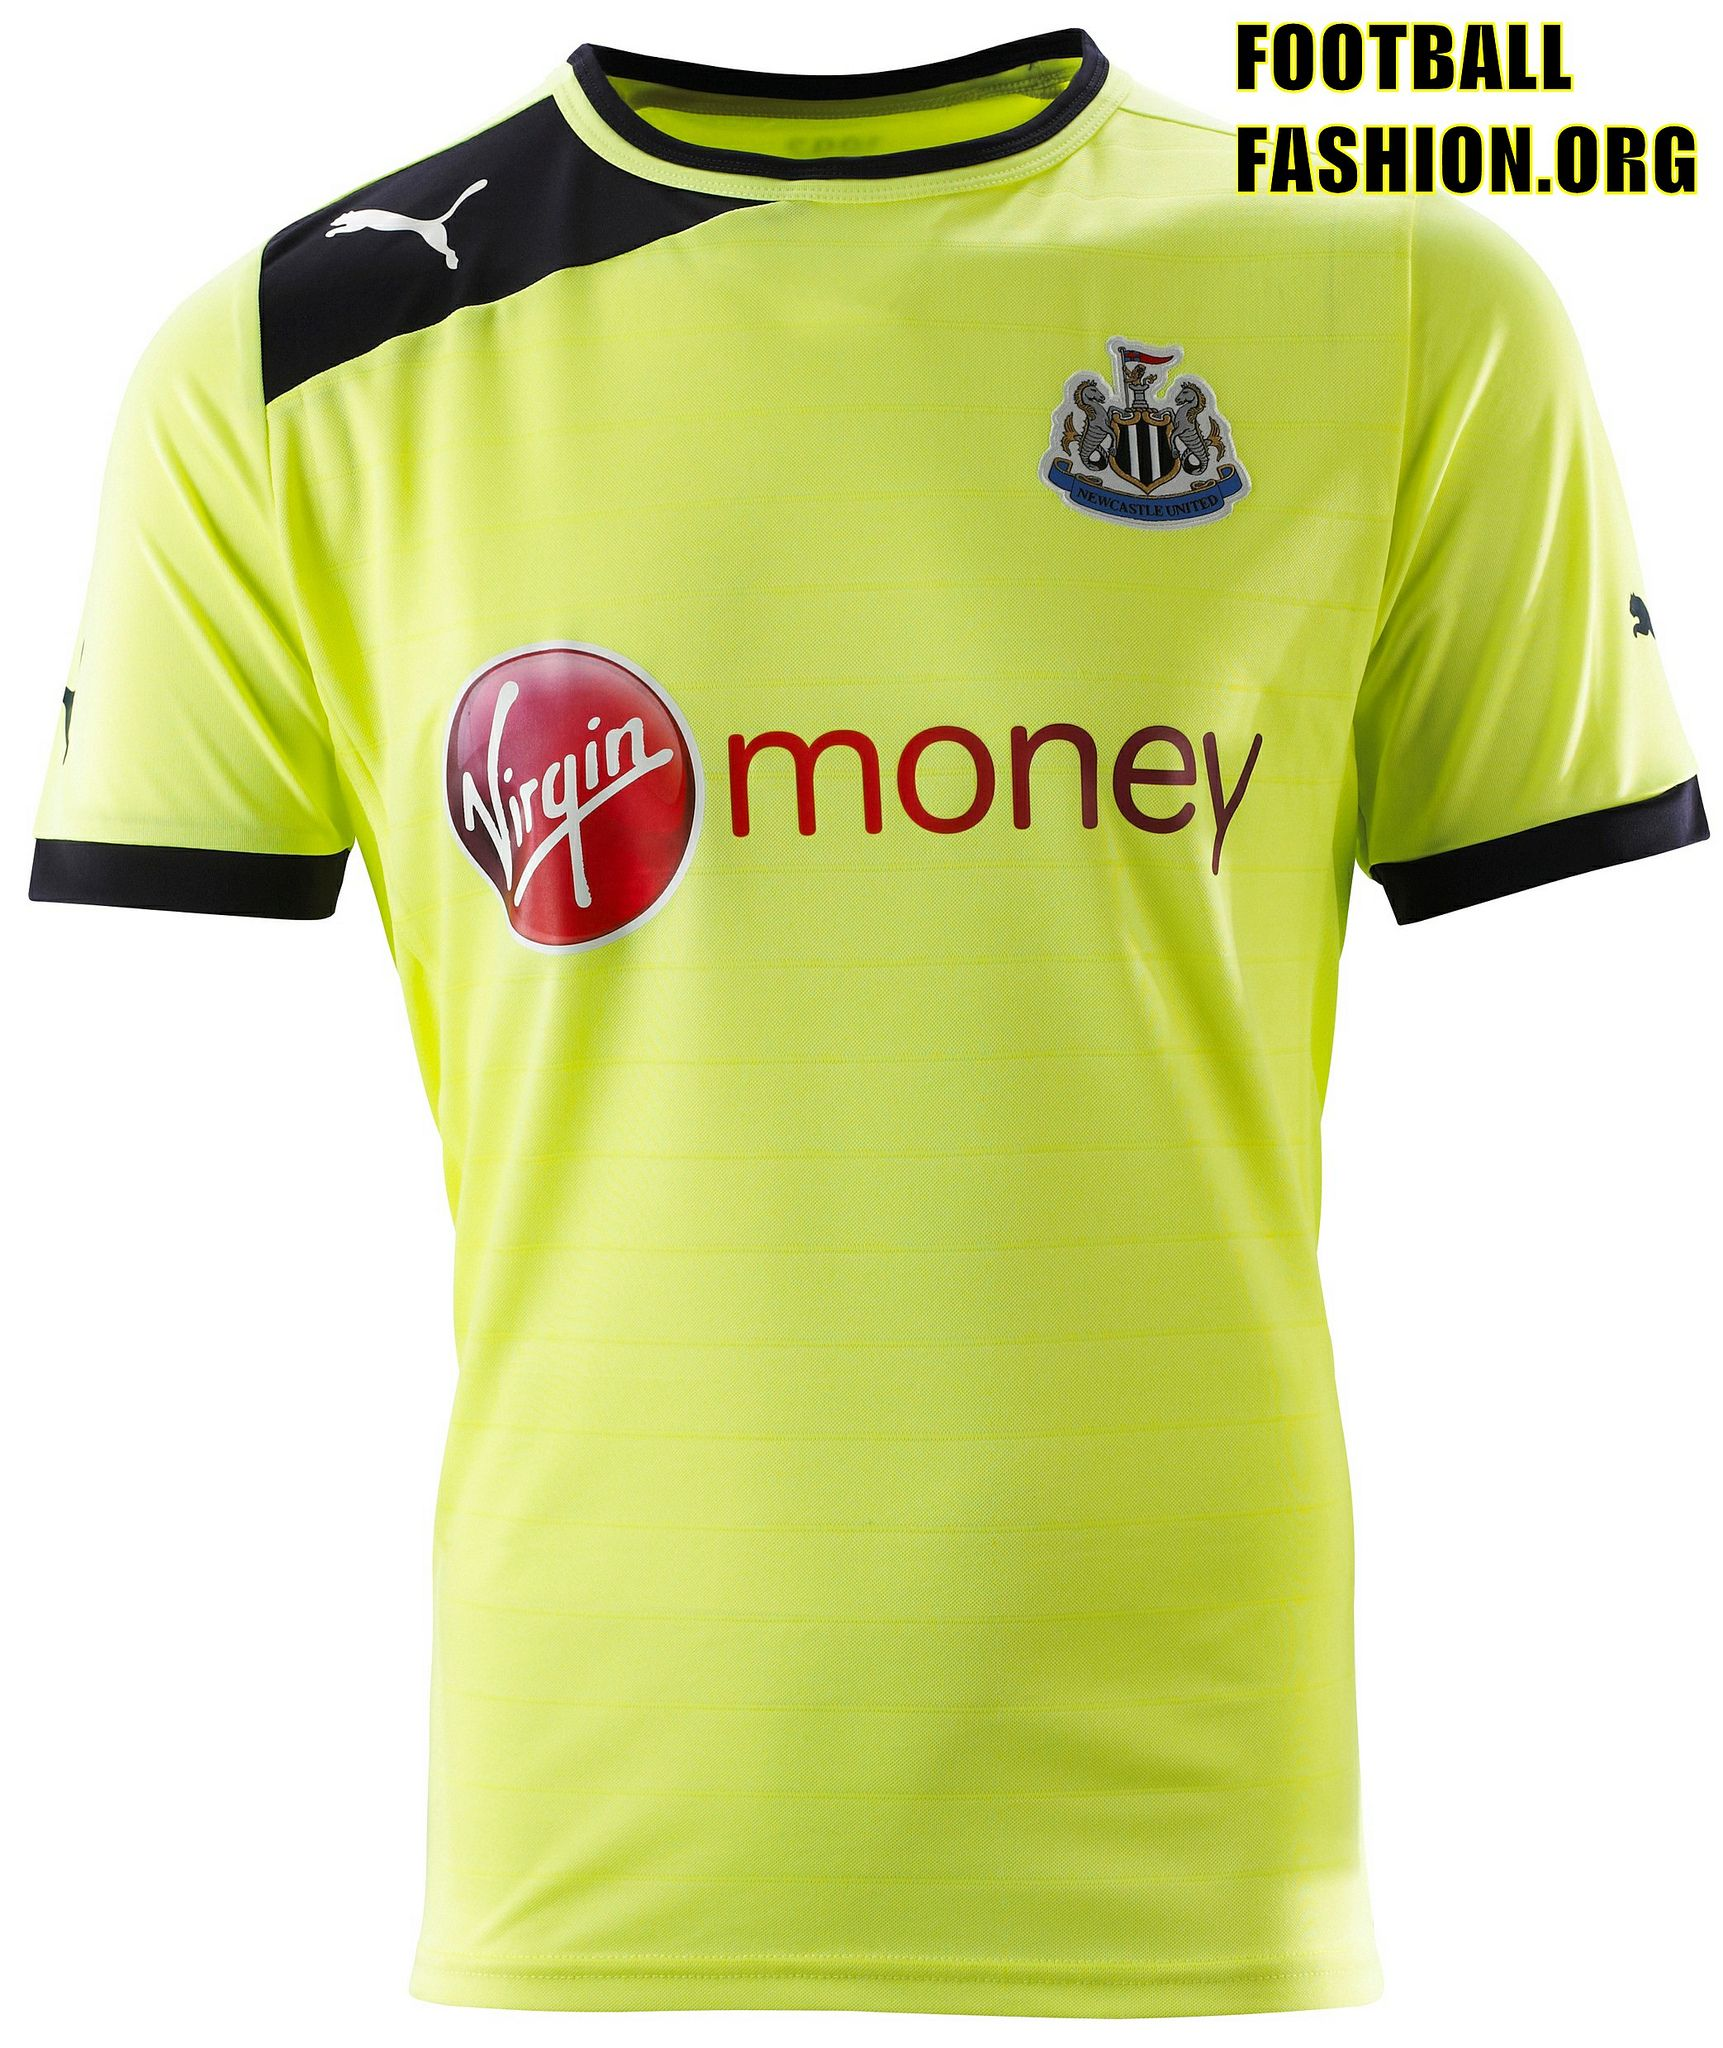 e7159a7edcdd8 Newcastle United PUMA 2012 13 Third Kit